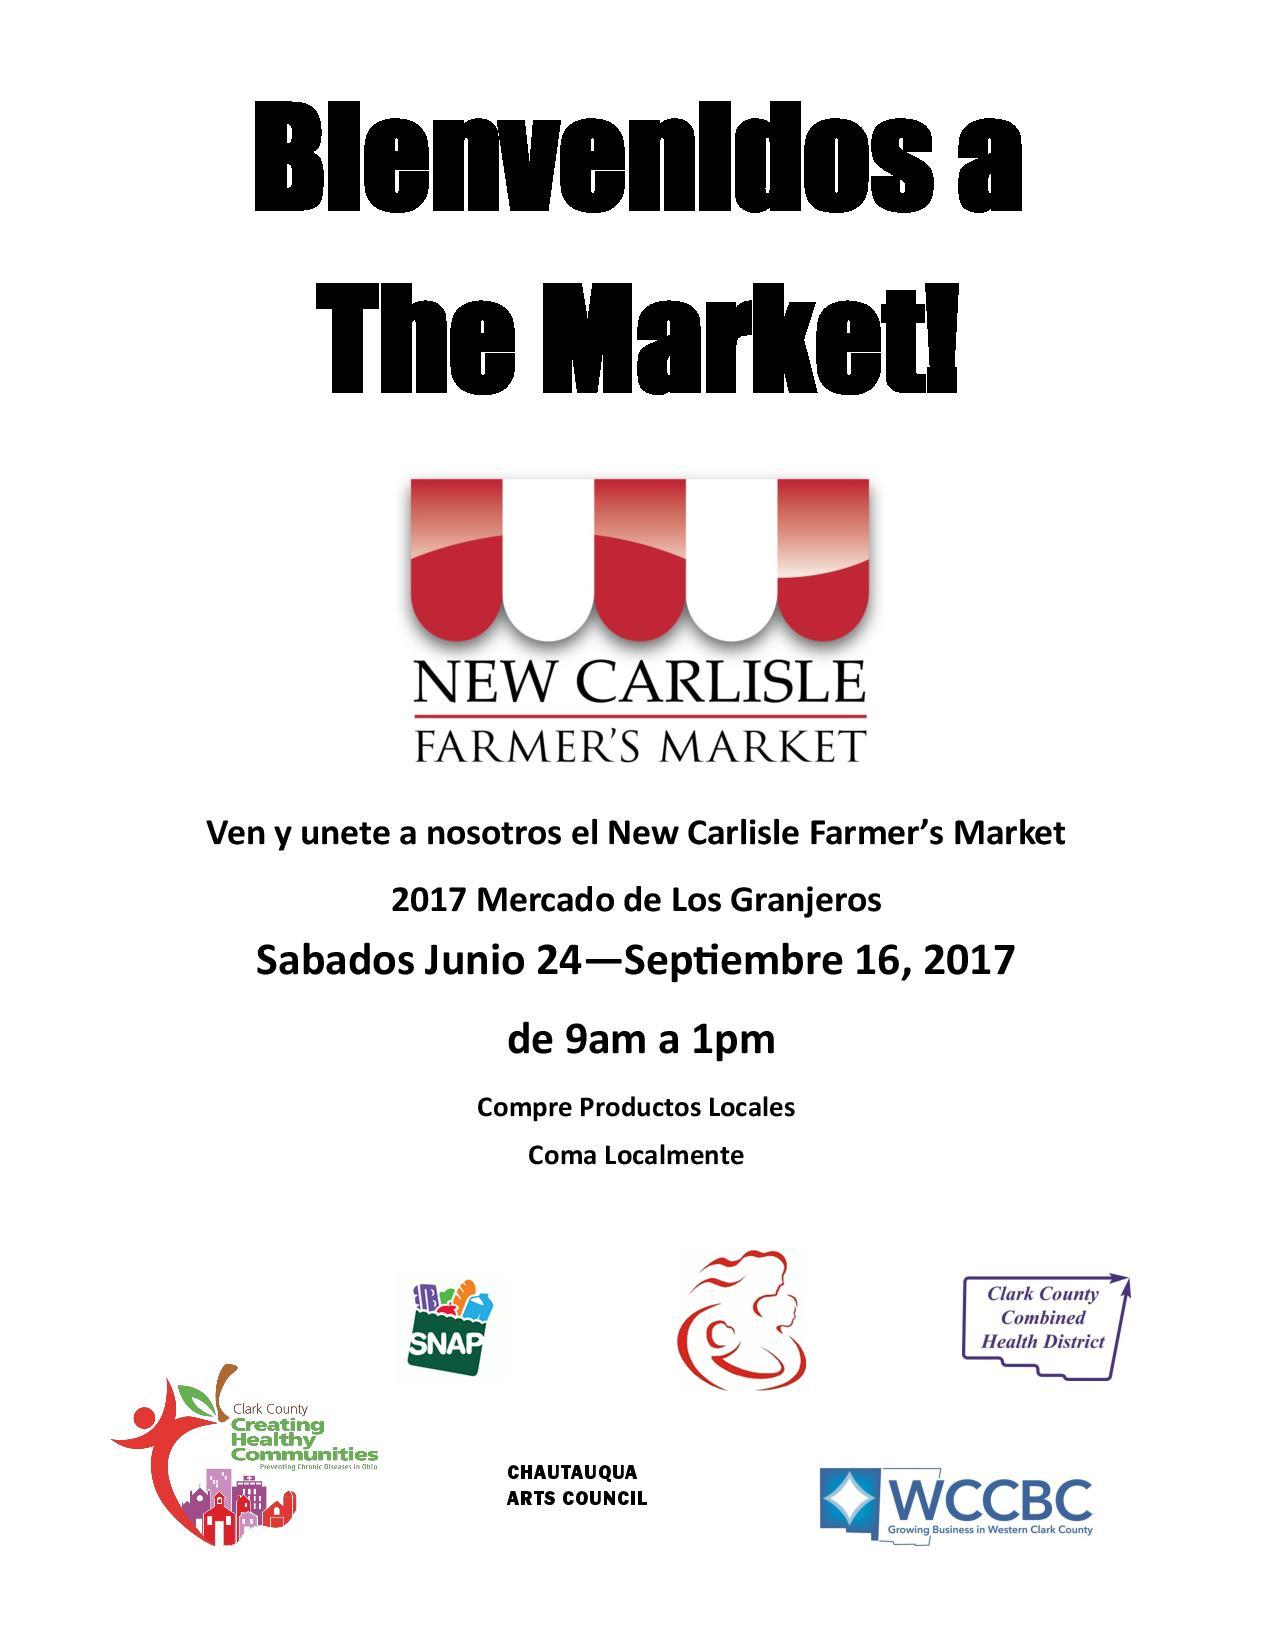 Ohio clark county new carlisle - Ncfm Promo General Aug 2017 Spanish Page 001